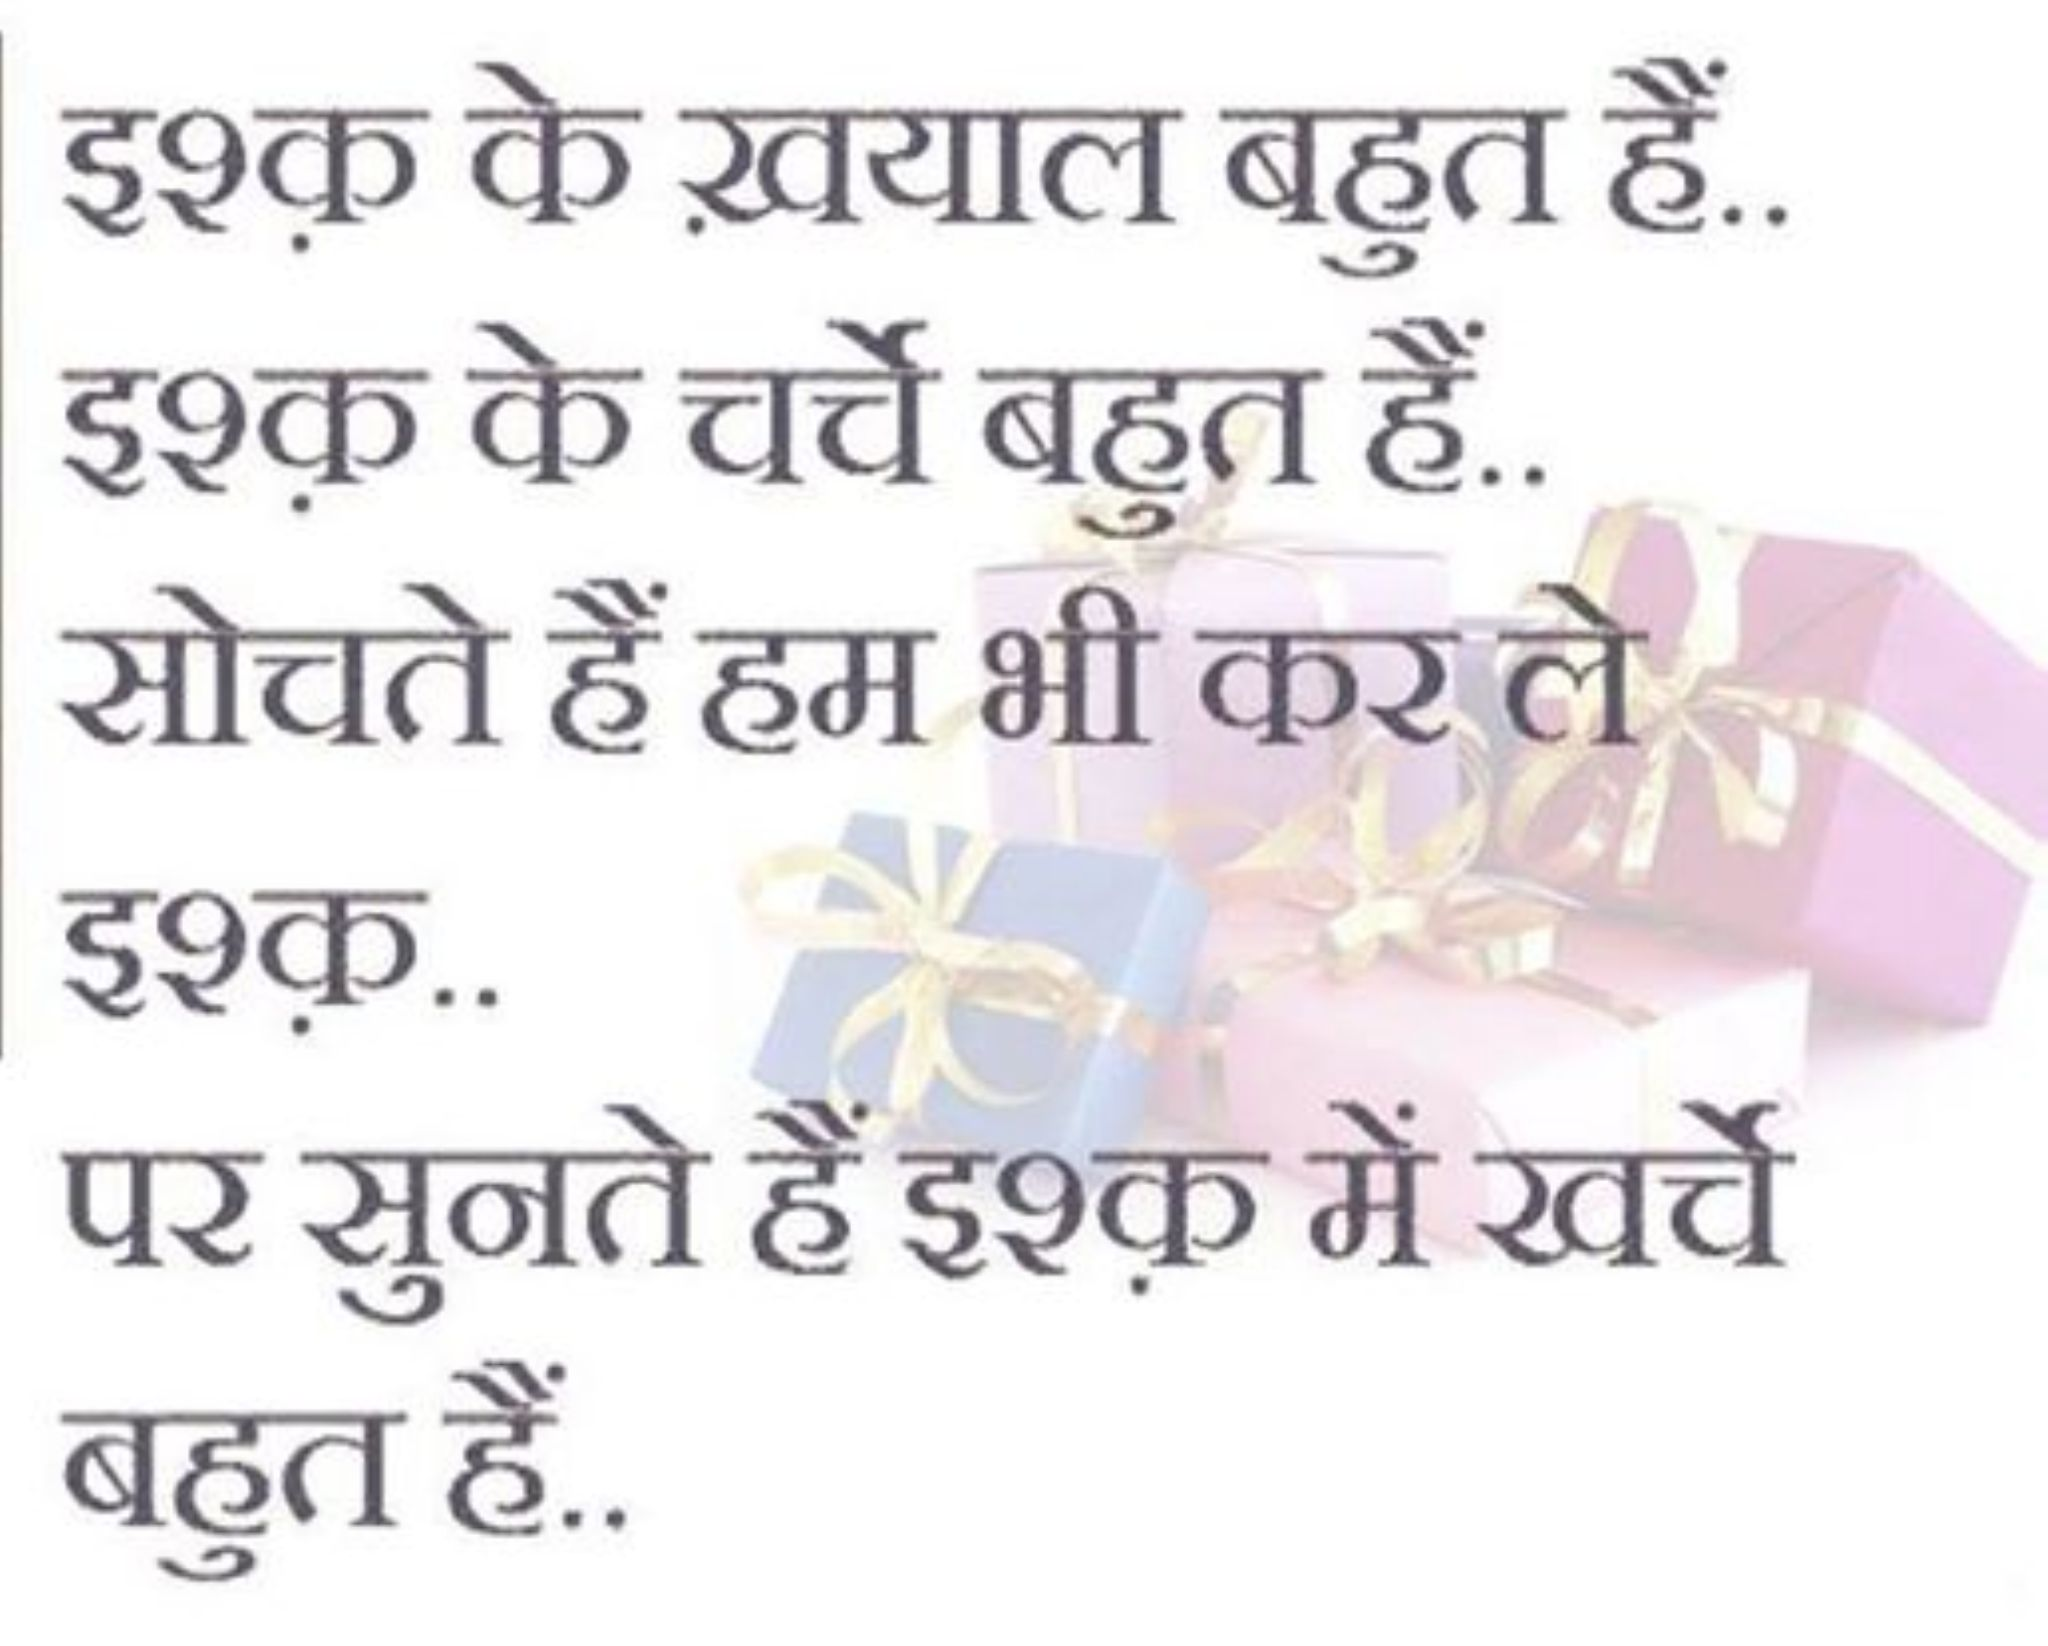 10155943_594847040625645_7457125845127836342_n by Ravi Dayma